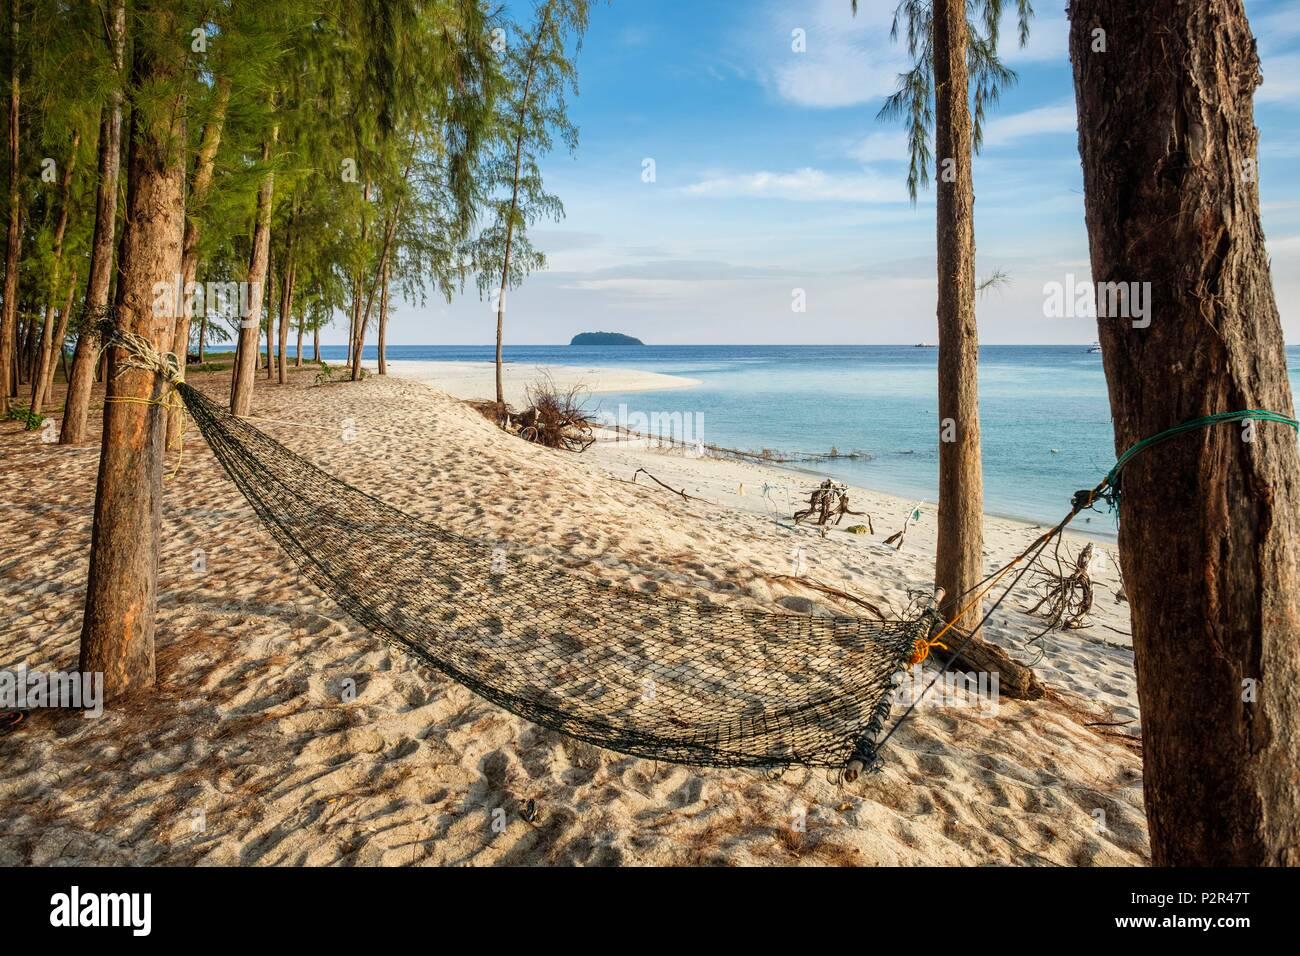 Thailand, Satun province, Tarutao National Marine Park, Ko Adang island, Laem Son beach lined with Casuarinas - Stock Image